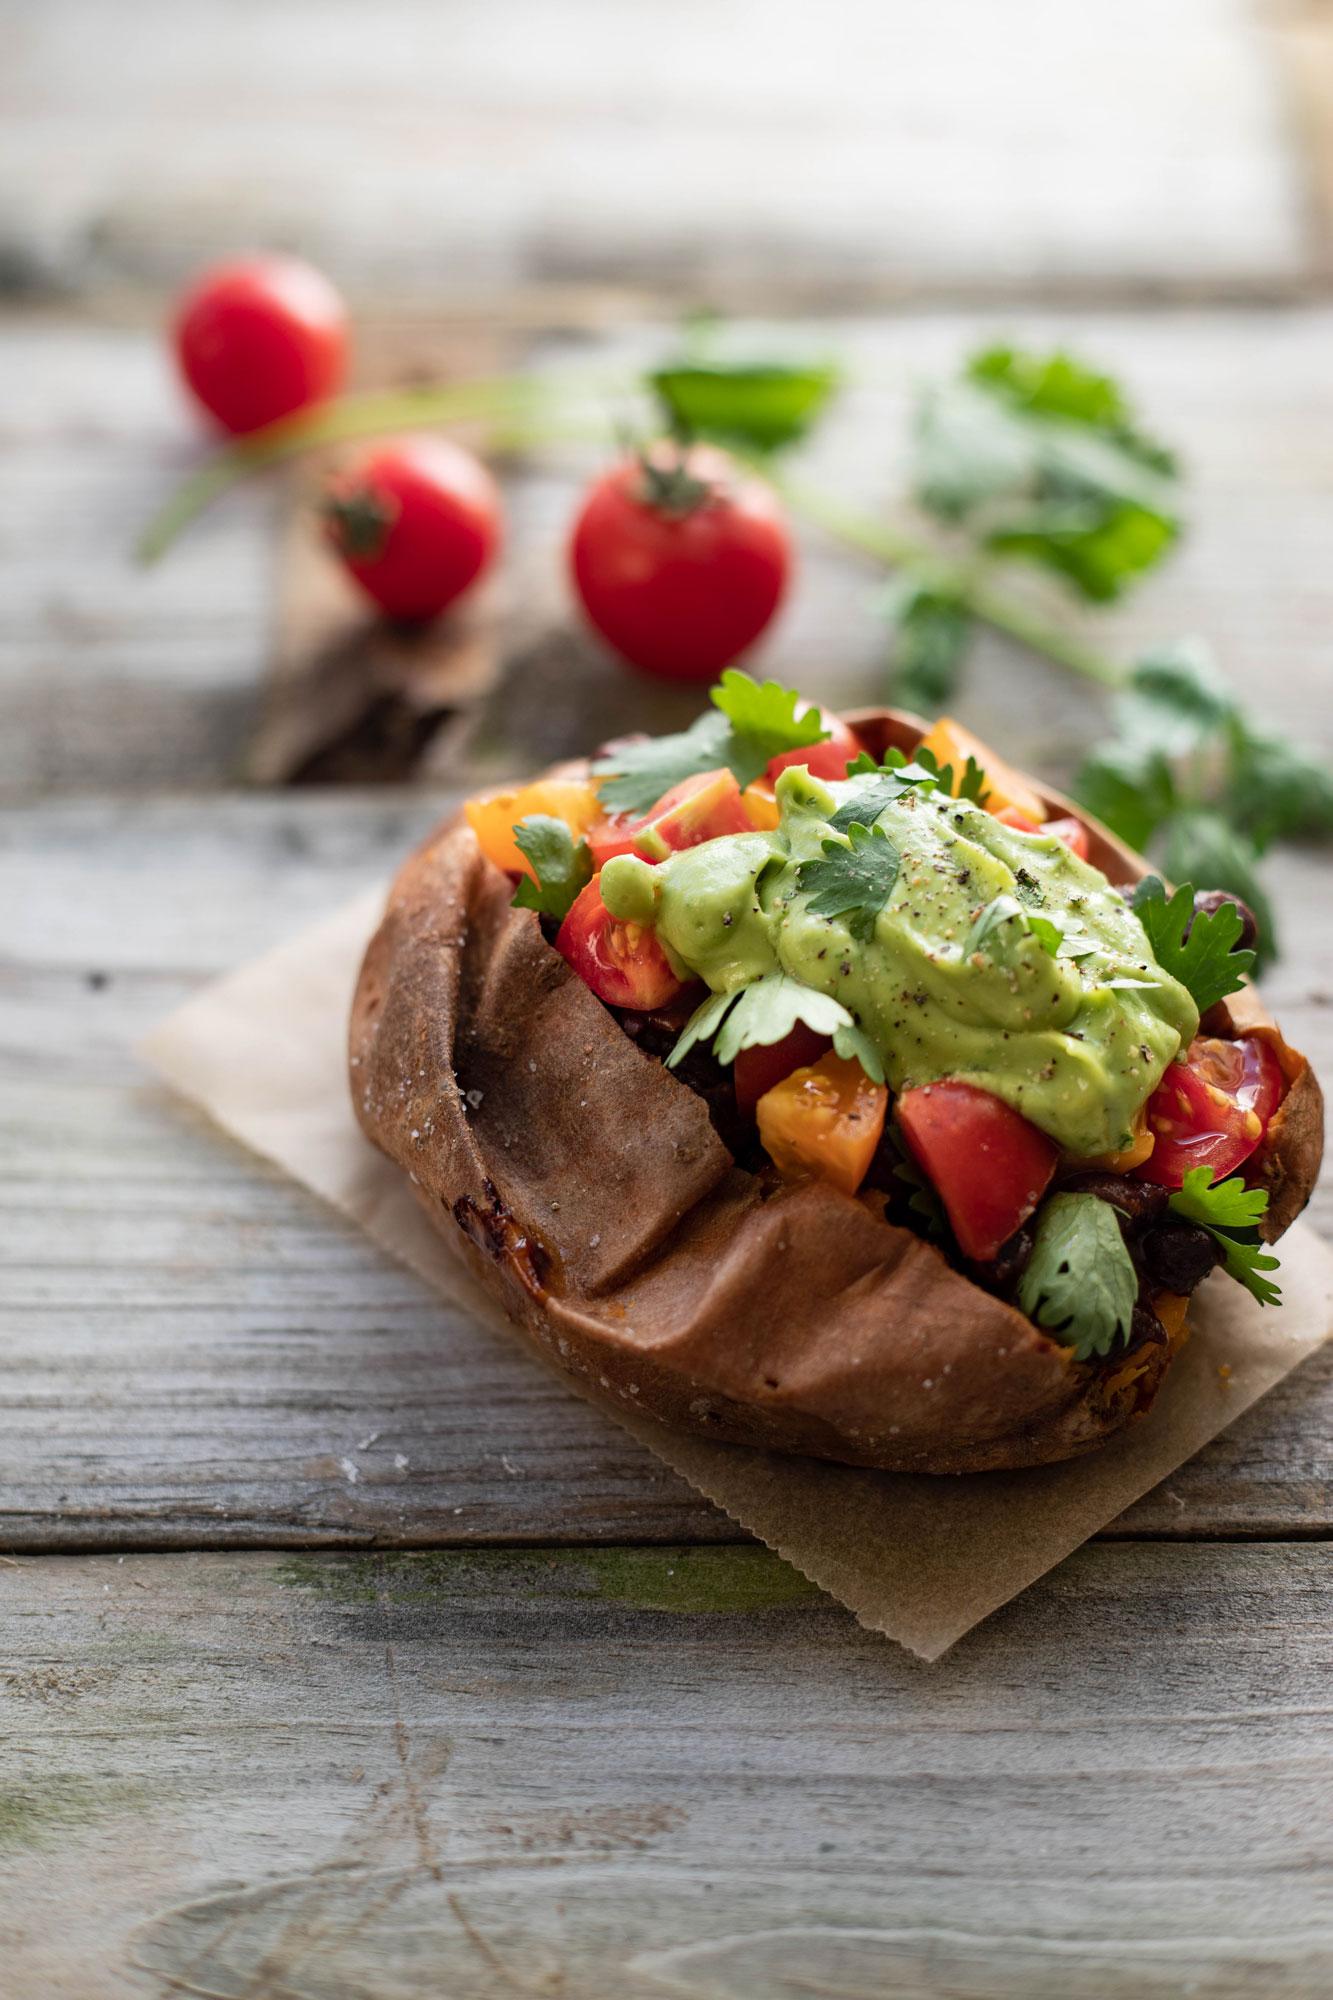 Vegan and GF Mexican stuffed sweet potatoes